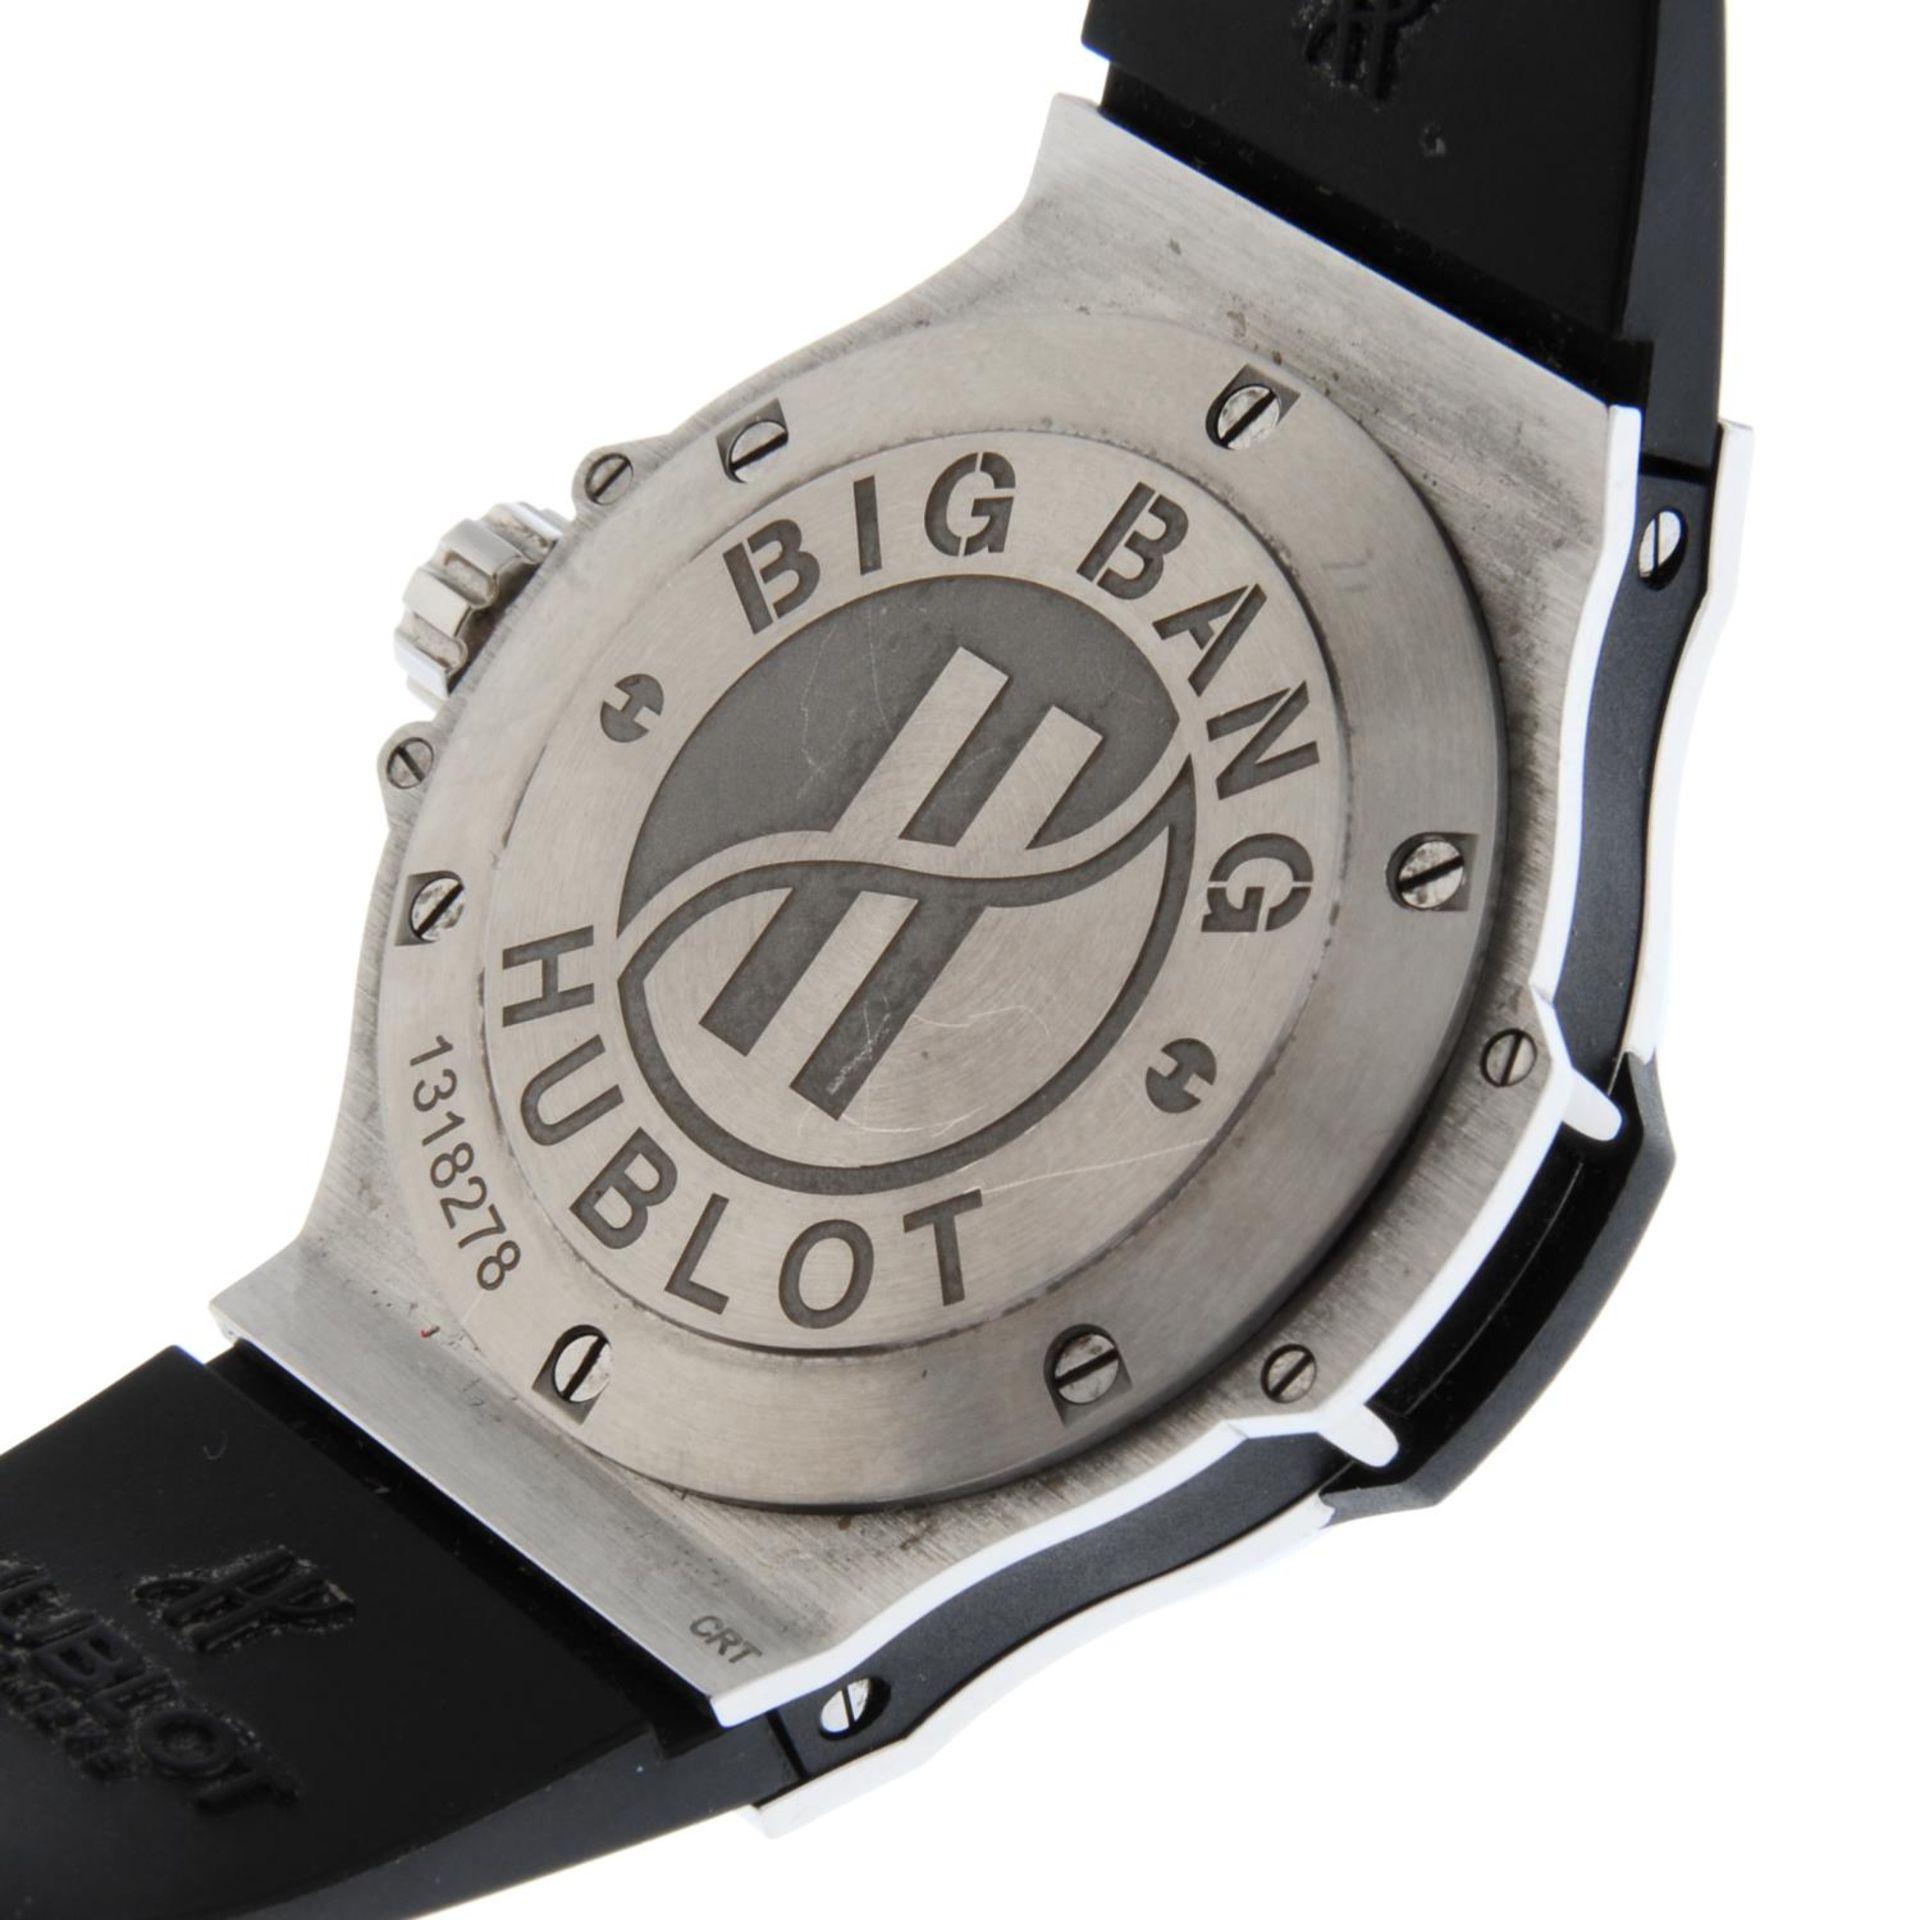 HUBLOT - a Big Bang wrist watch. - Bild 5 aus 6